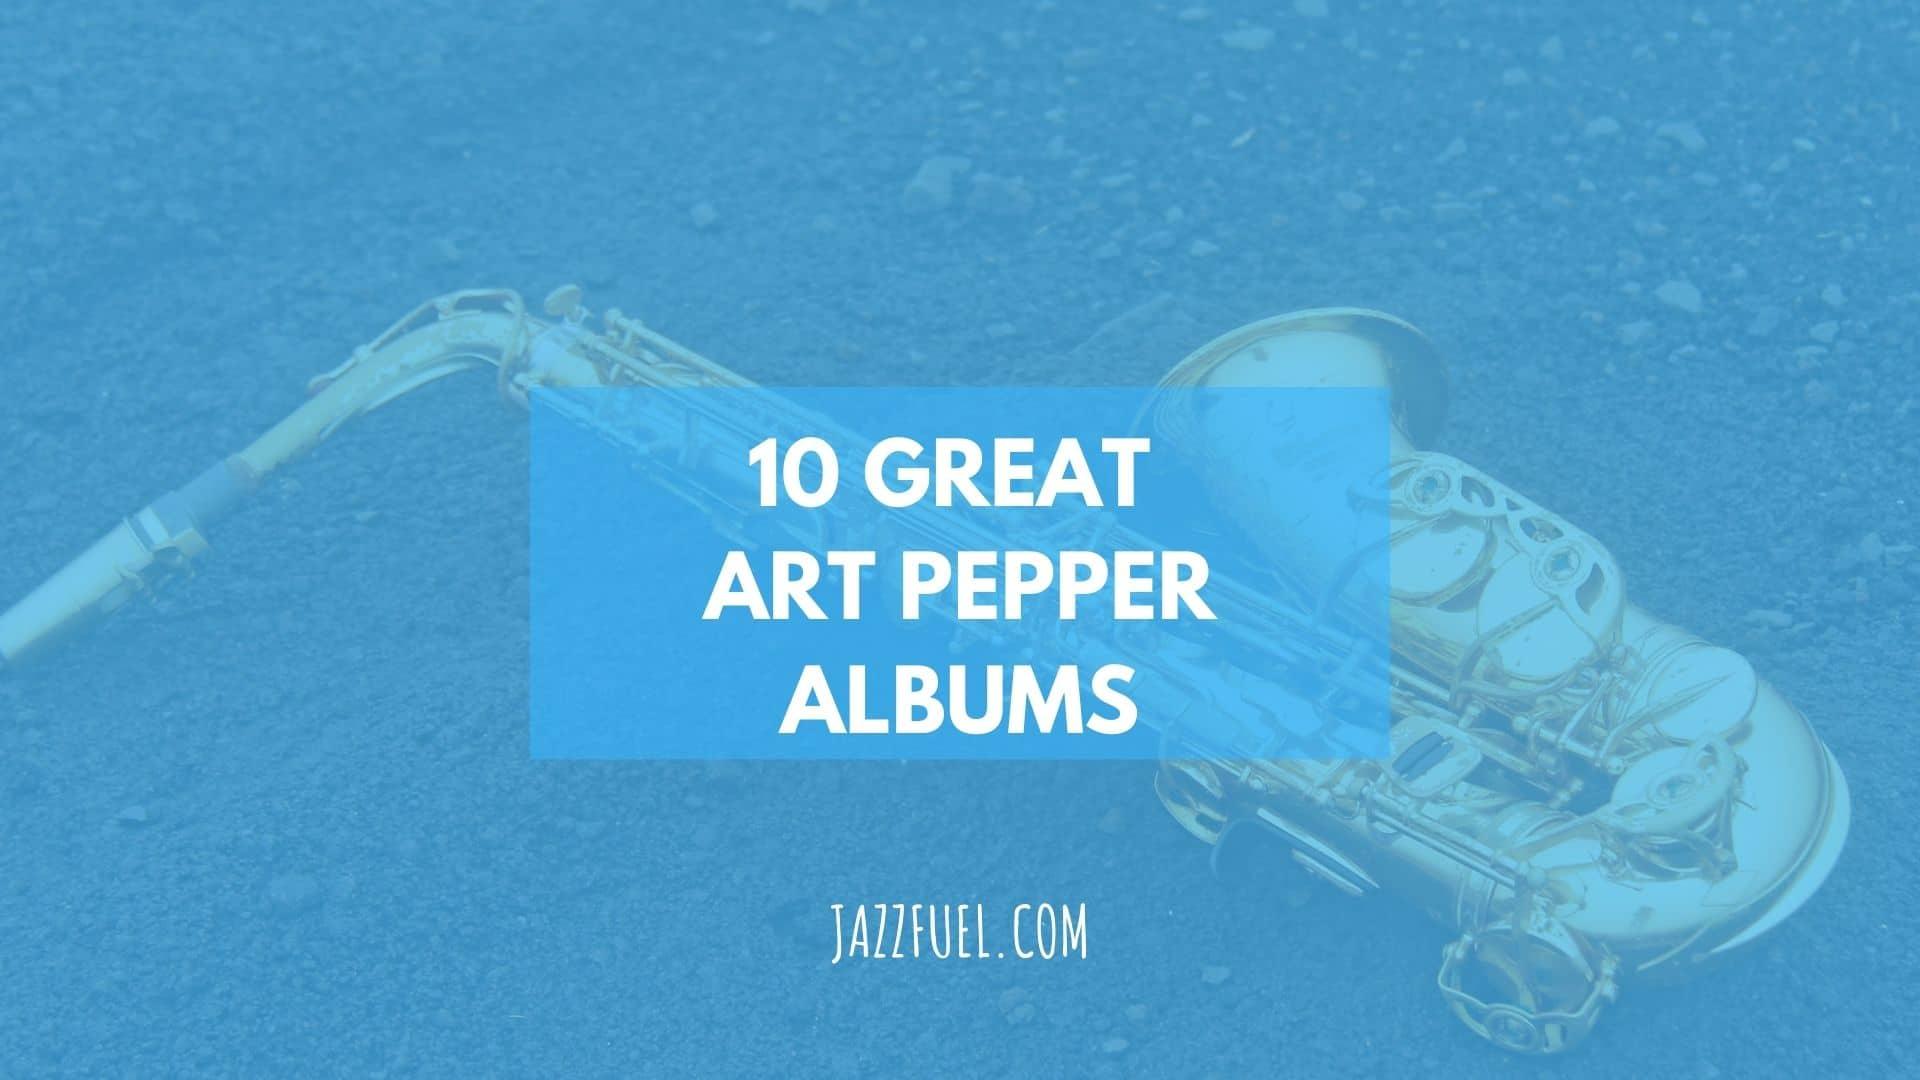 Art Pepper albums